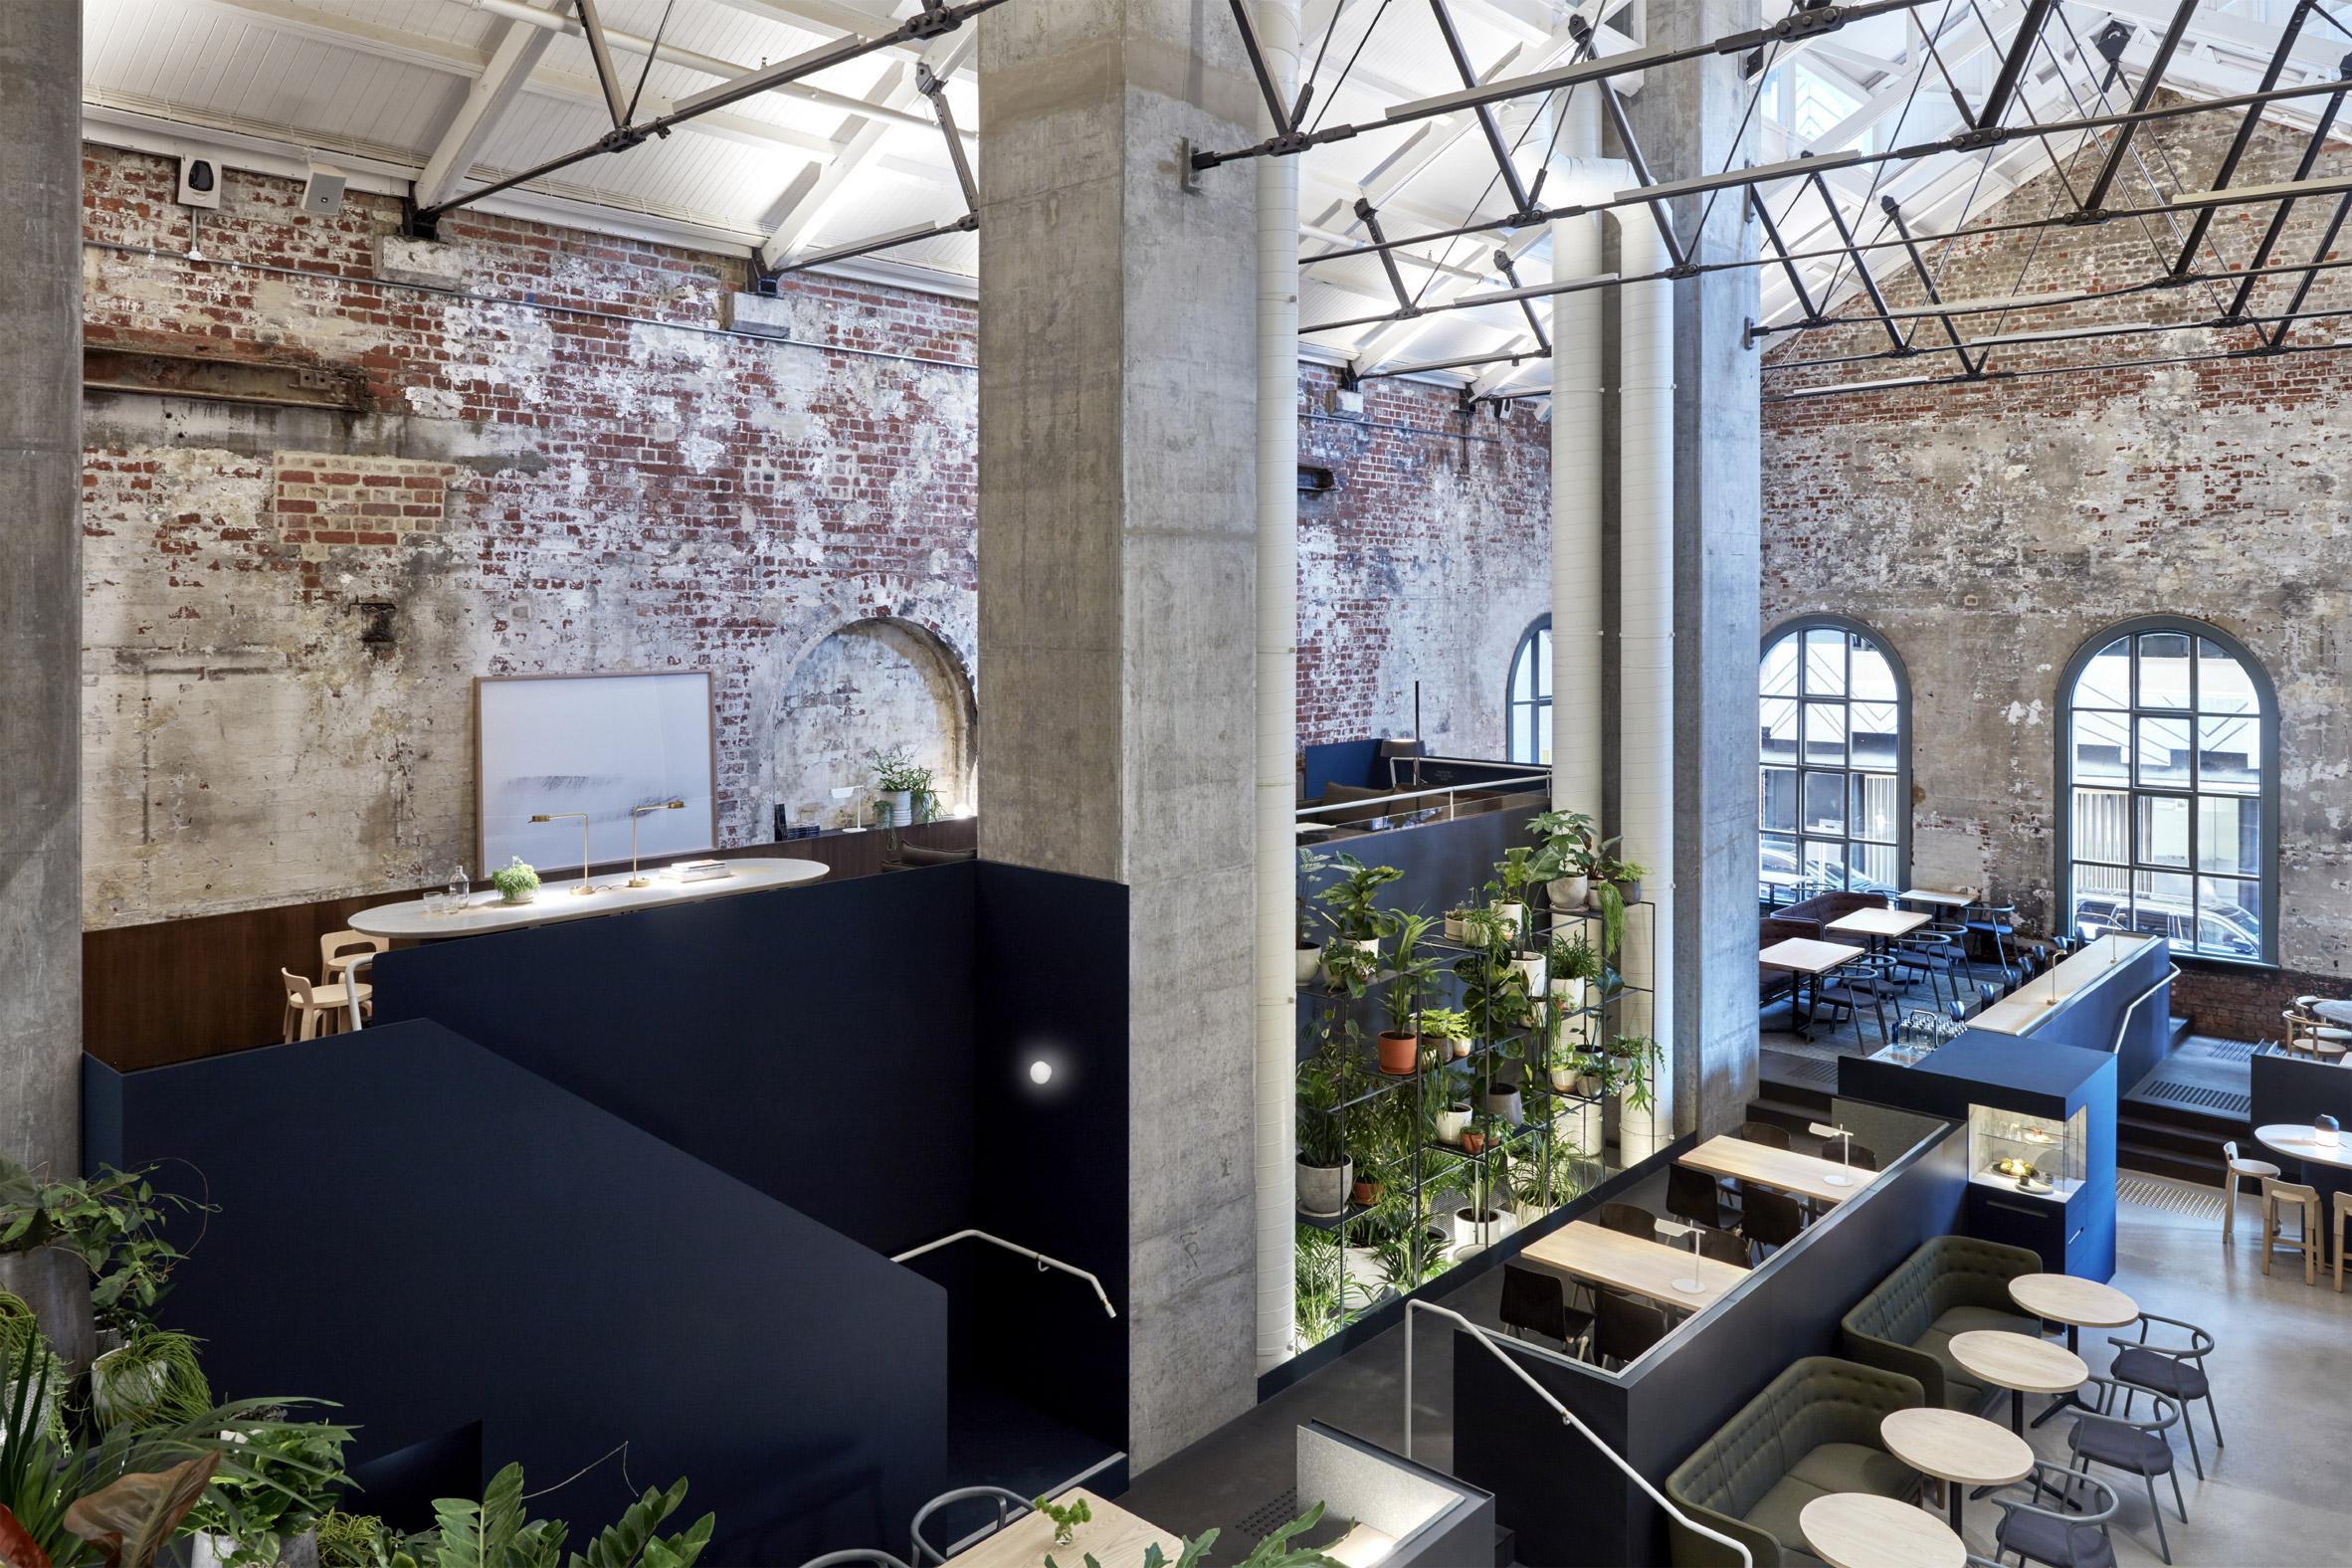 DesignOffice for Higher Ground